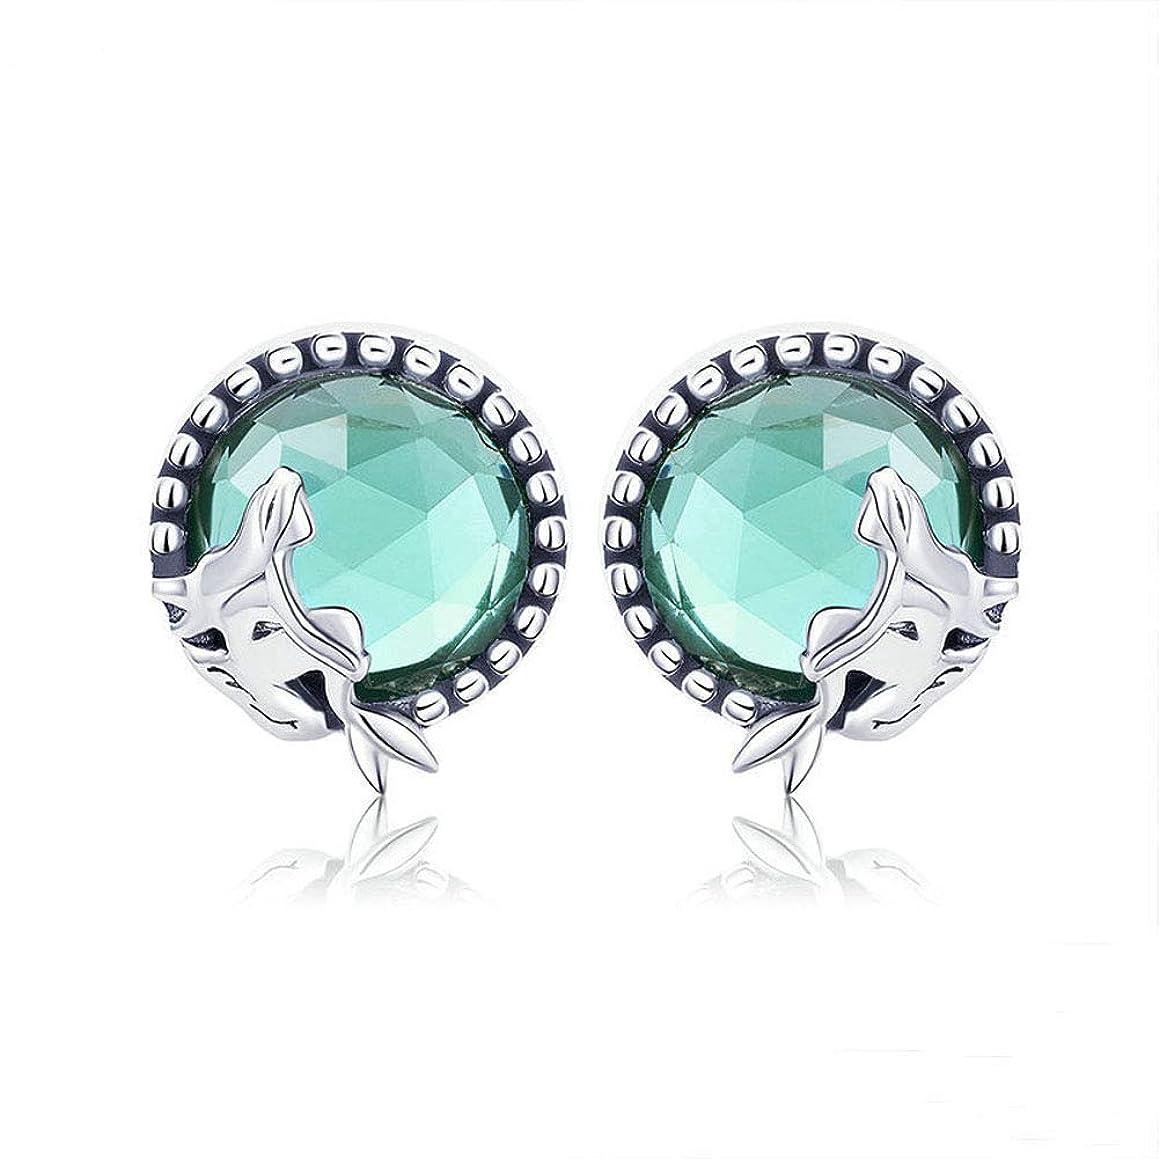 Earrings 925 Sterling Silver Dangler for Women Girls Classic Crystal Ear Hoop (Mermaid)